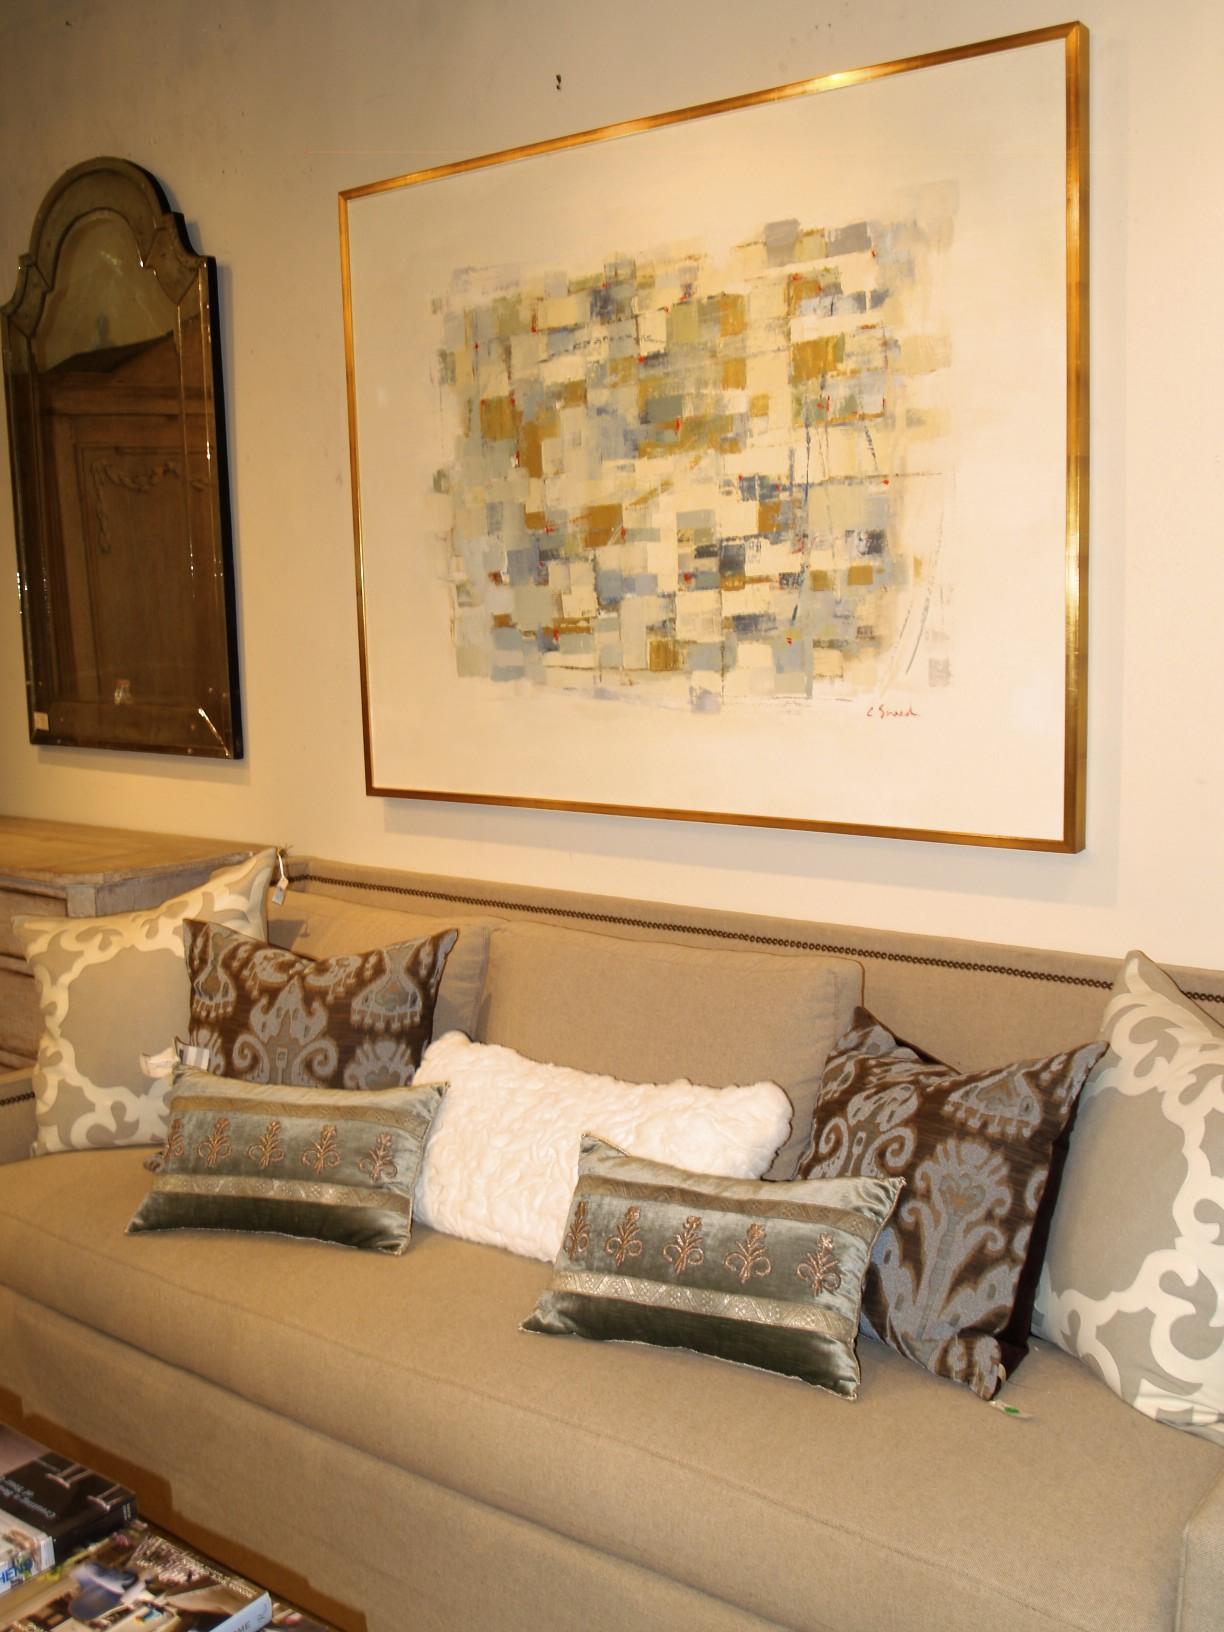 antiques, pillows, artwork